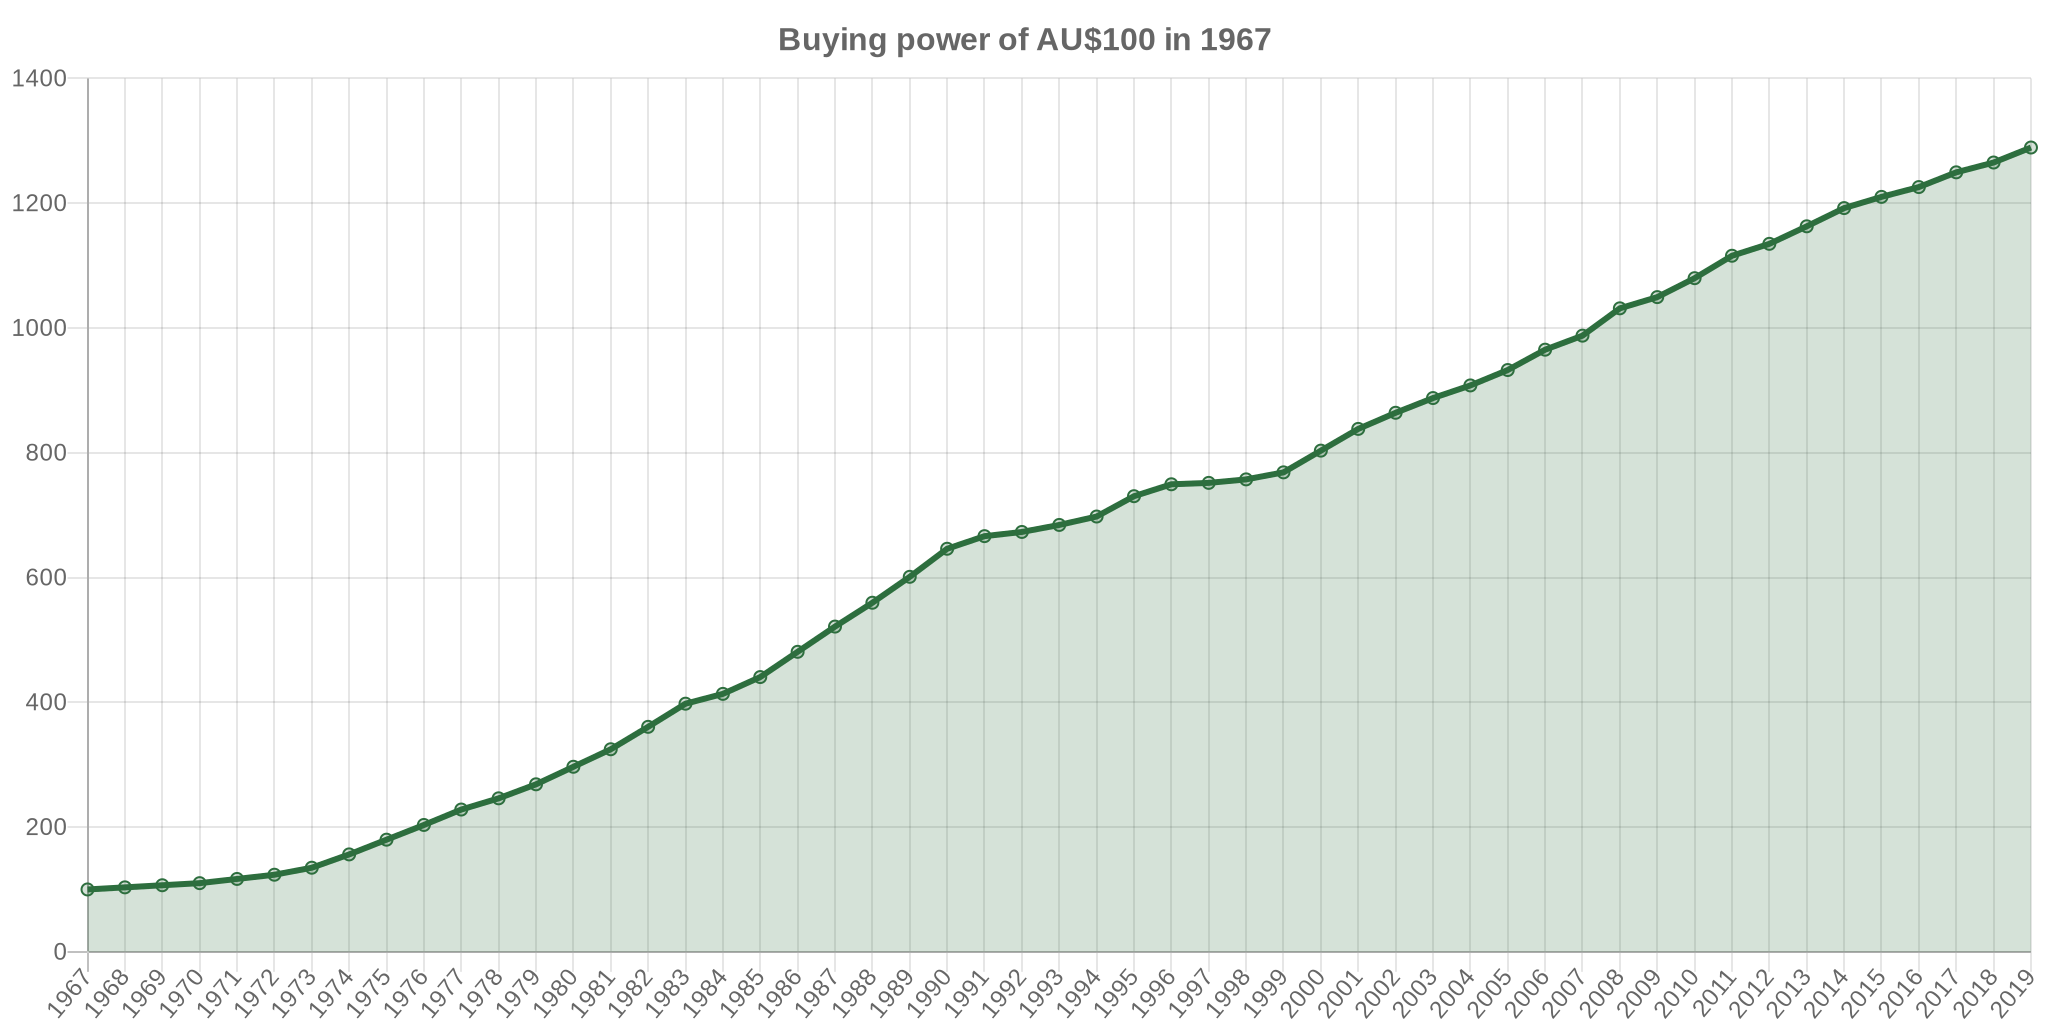 1967 dollars in 2017 | Australia Inflation Calculator